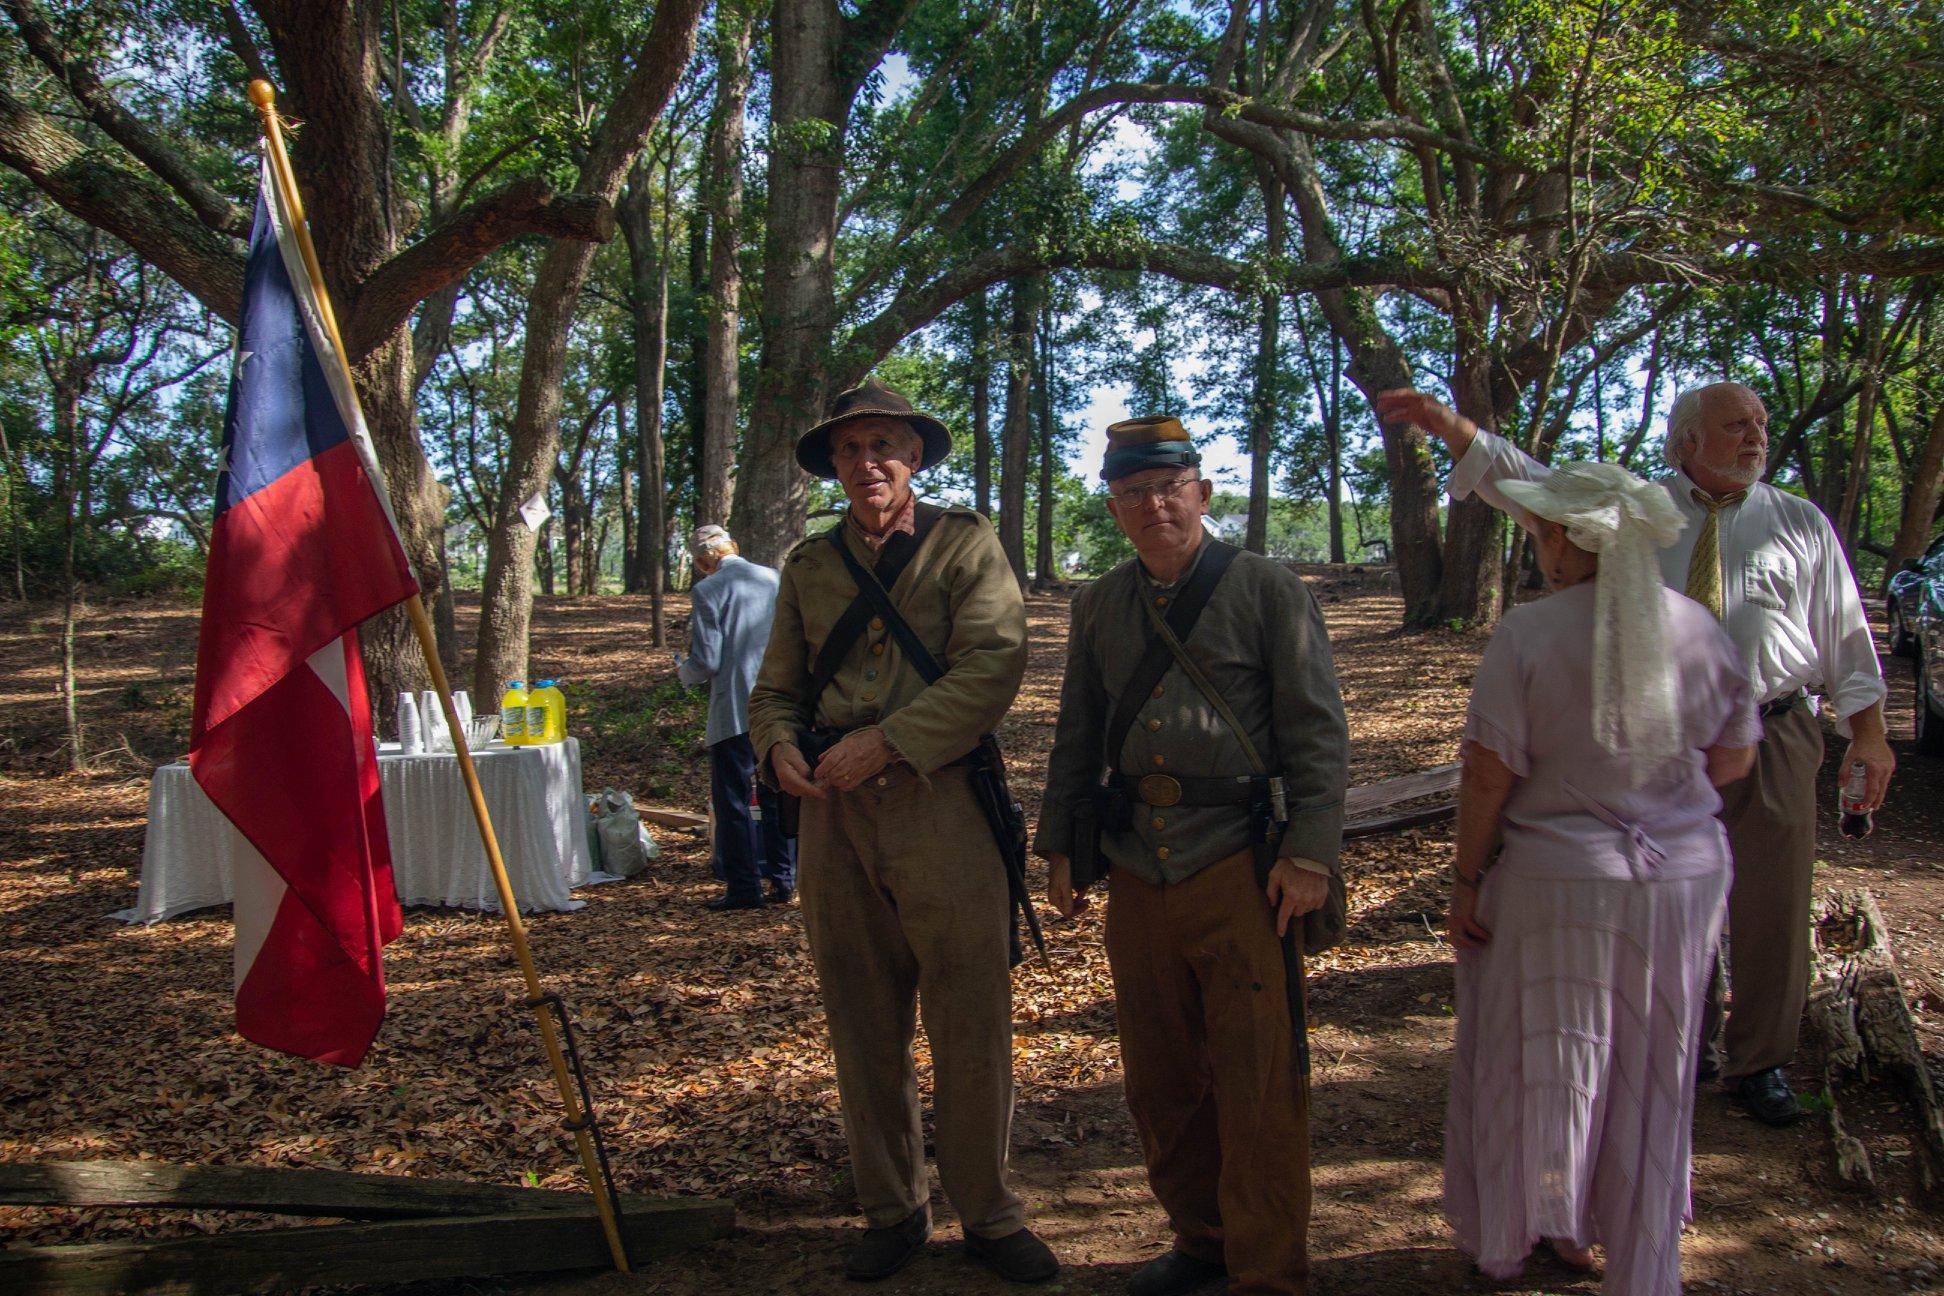 The annual anniversary of the Battle of Secessionville1